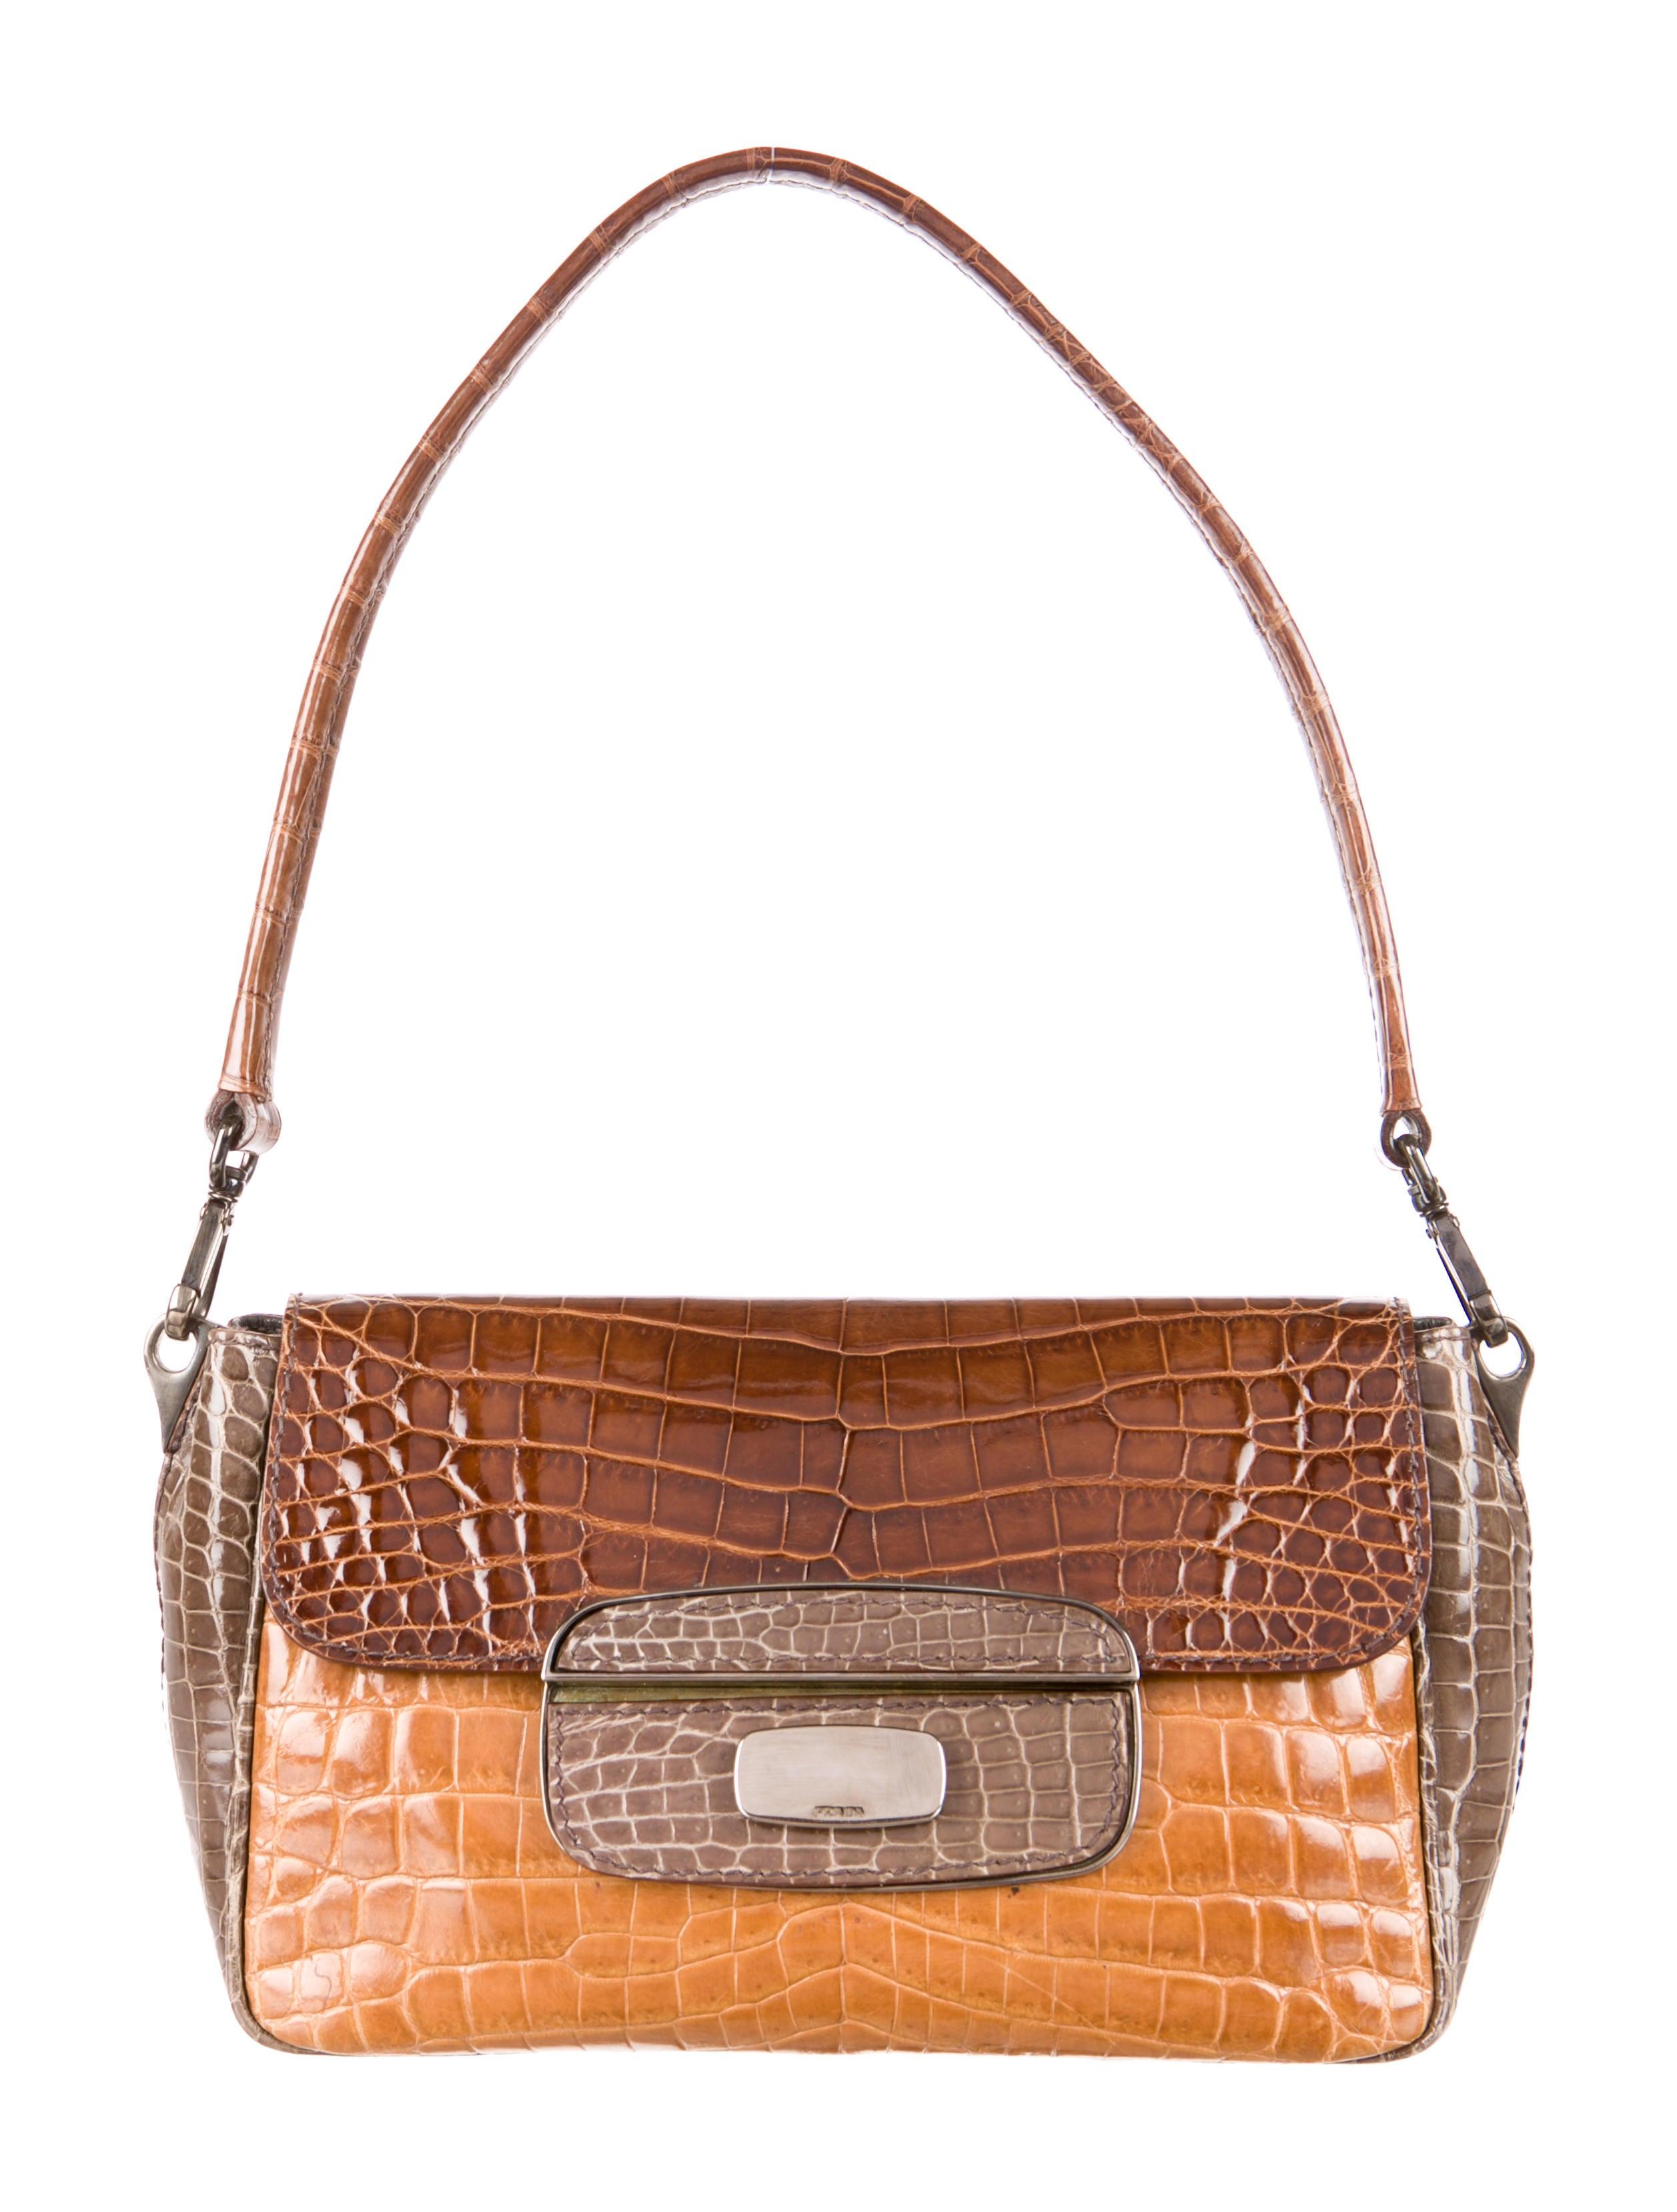 03bc690dca7e Prada Glazed Crocodile Bag - Handbags - PRA52119 | The RealReal